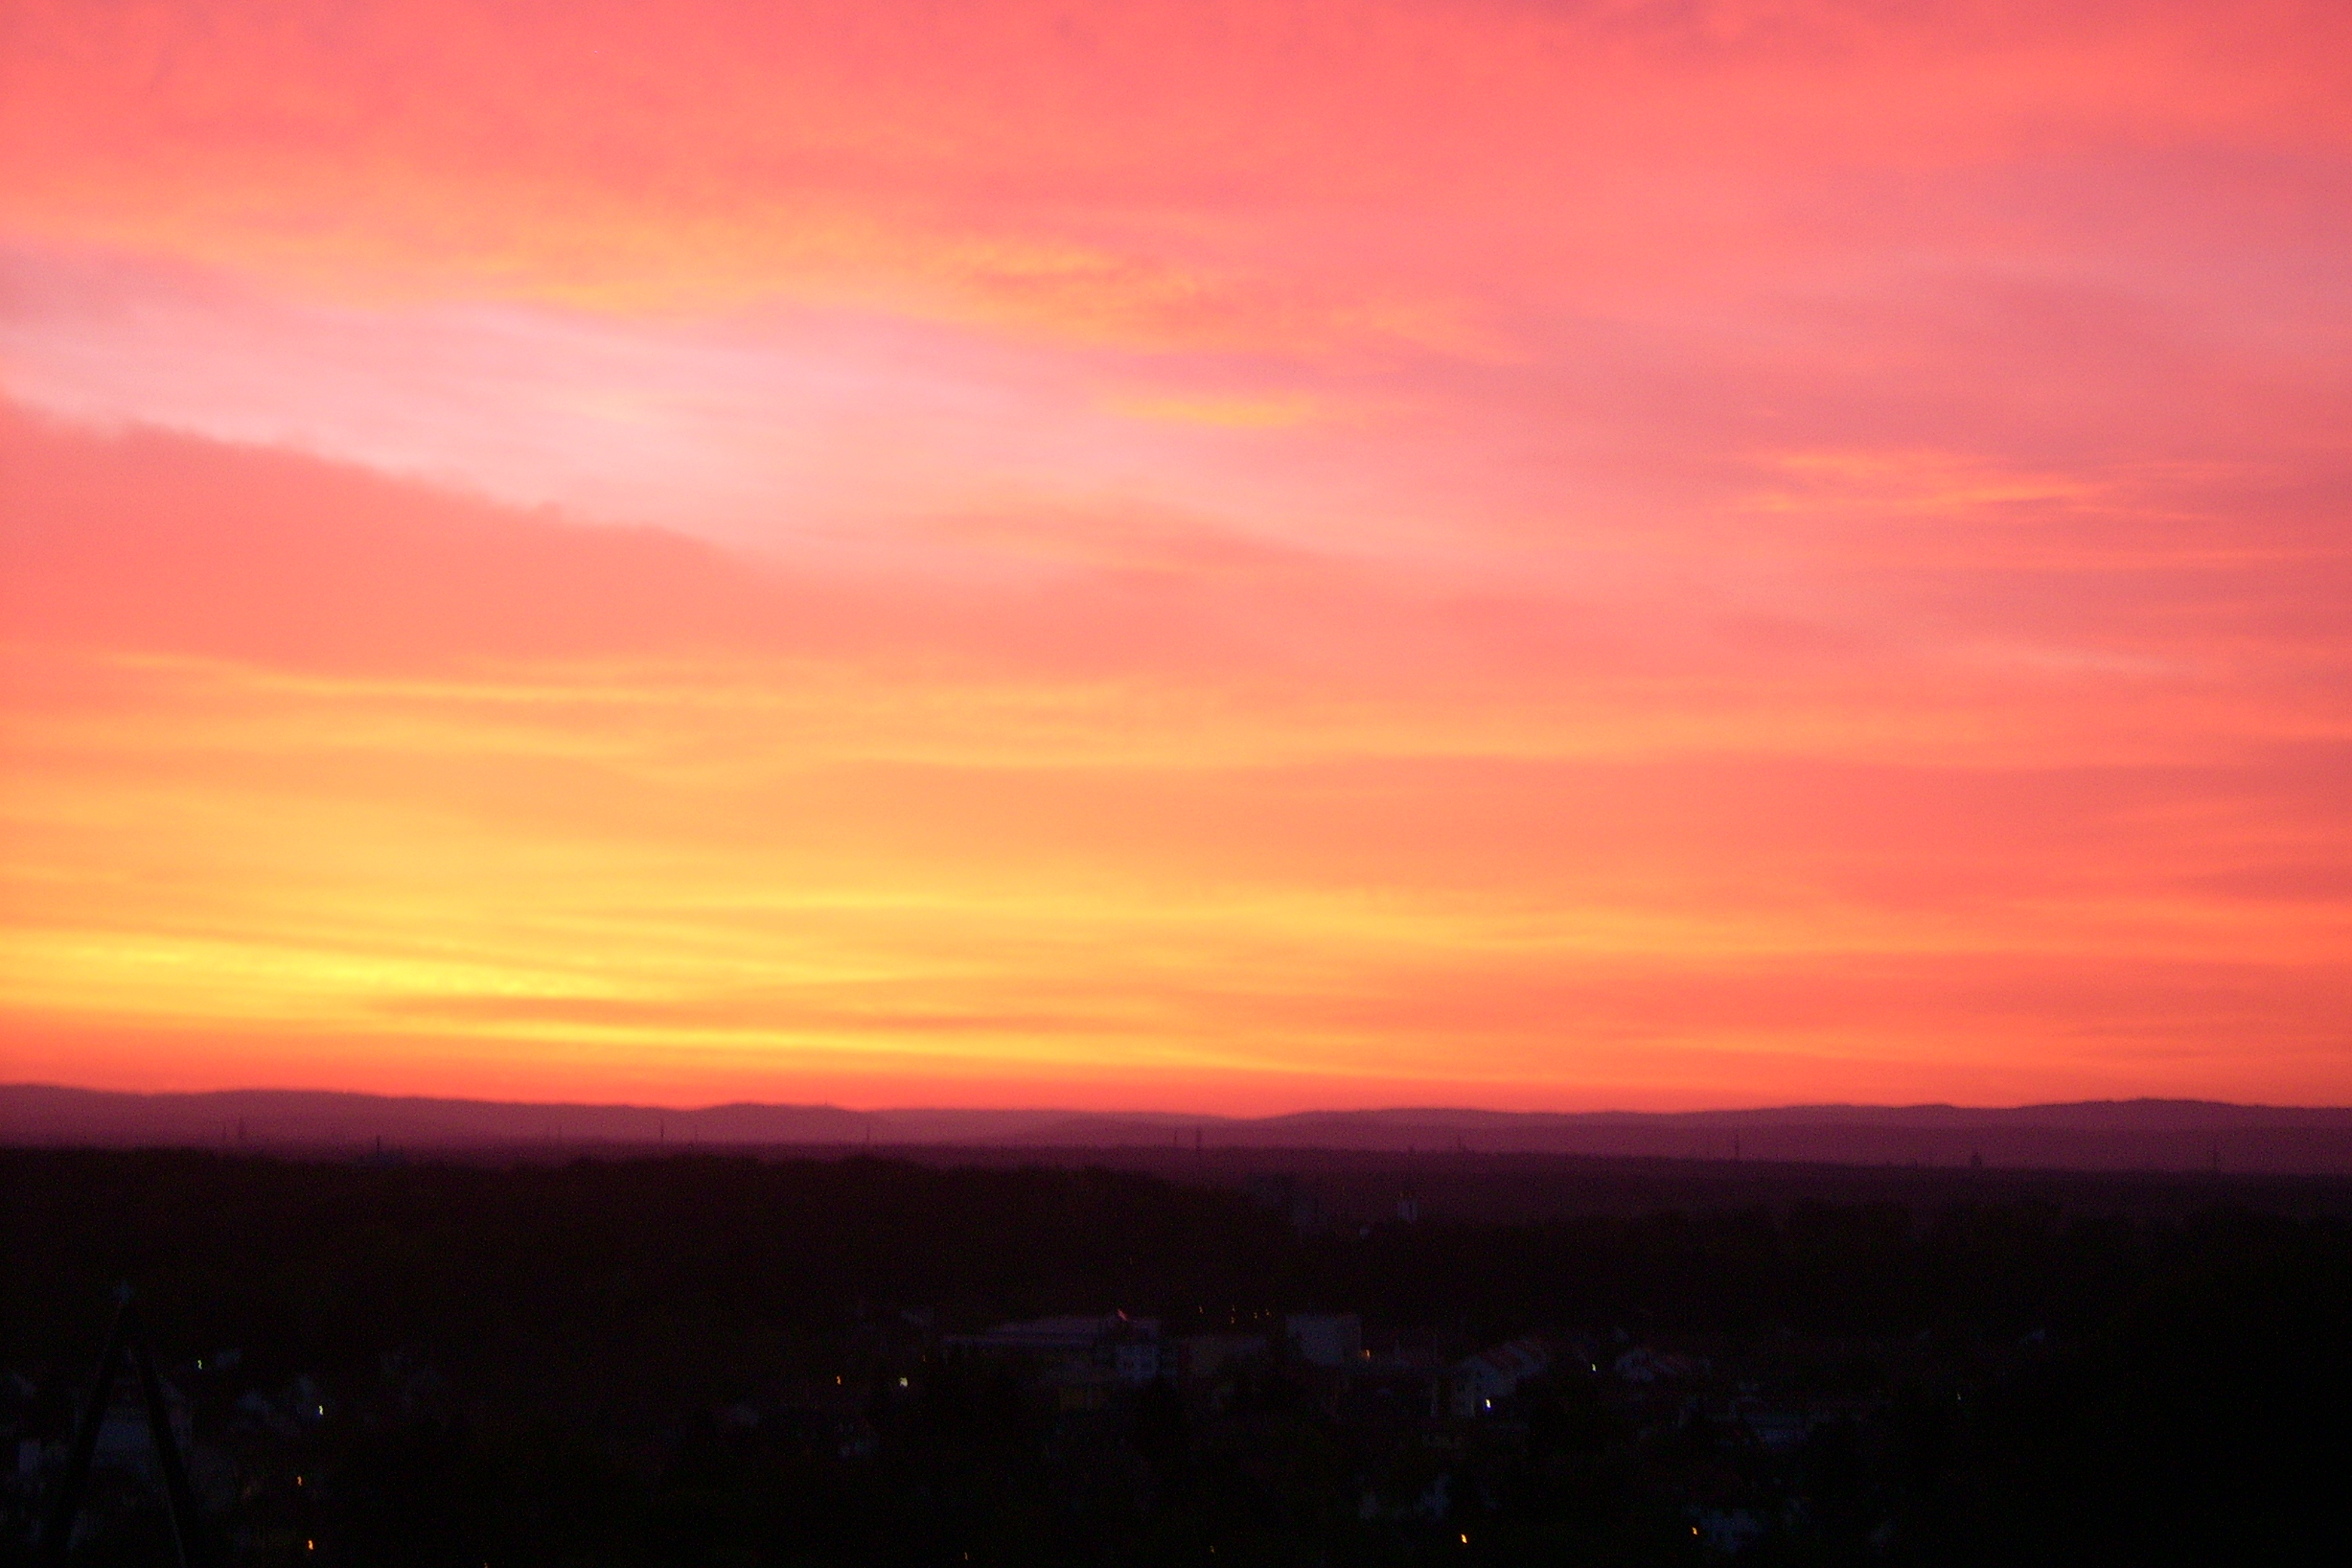 File:Red Sky - Dawn 1.JPG - Wikimedia Commons